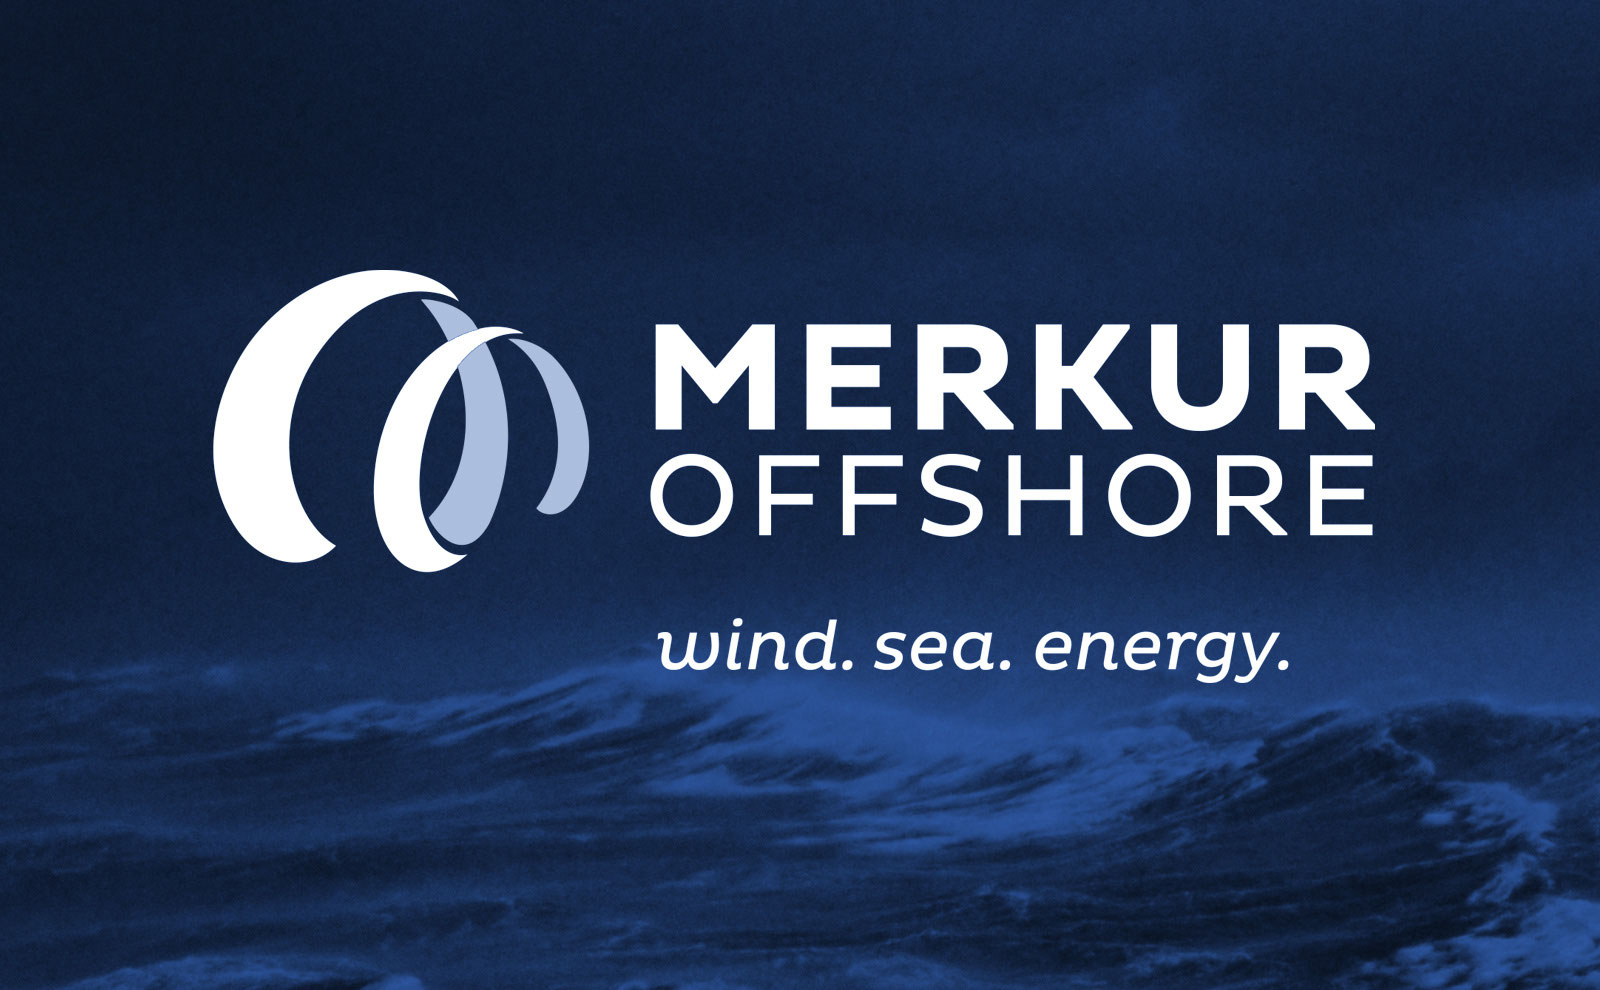 Windkraft Logo Windenergie